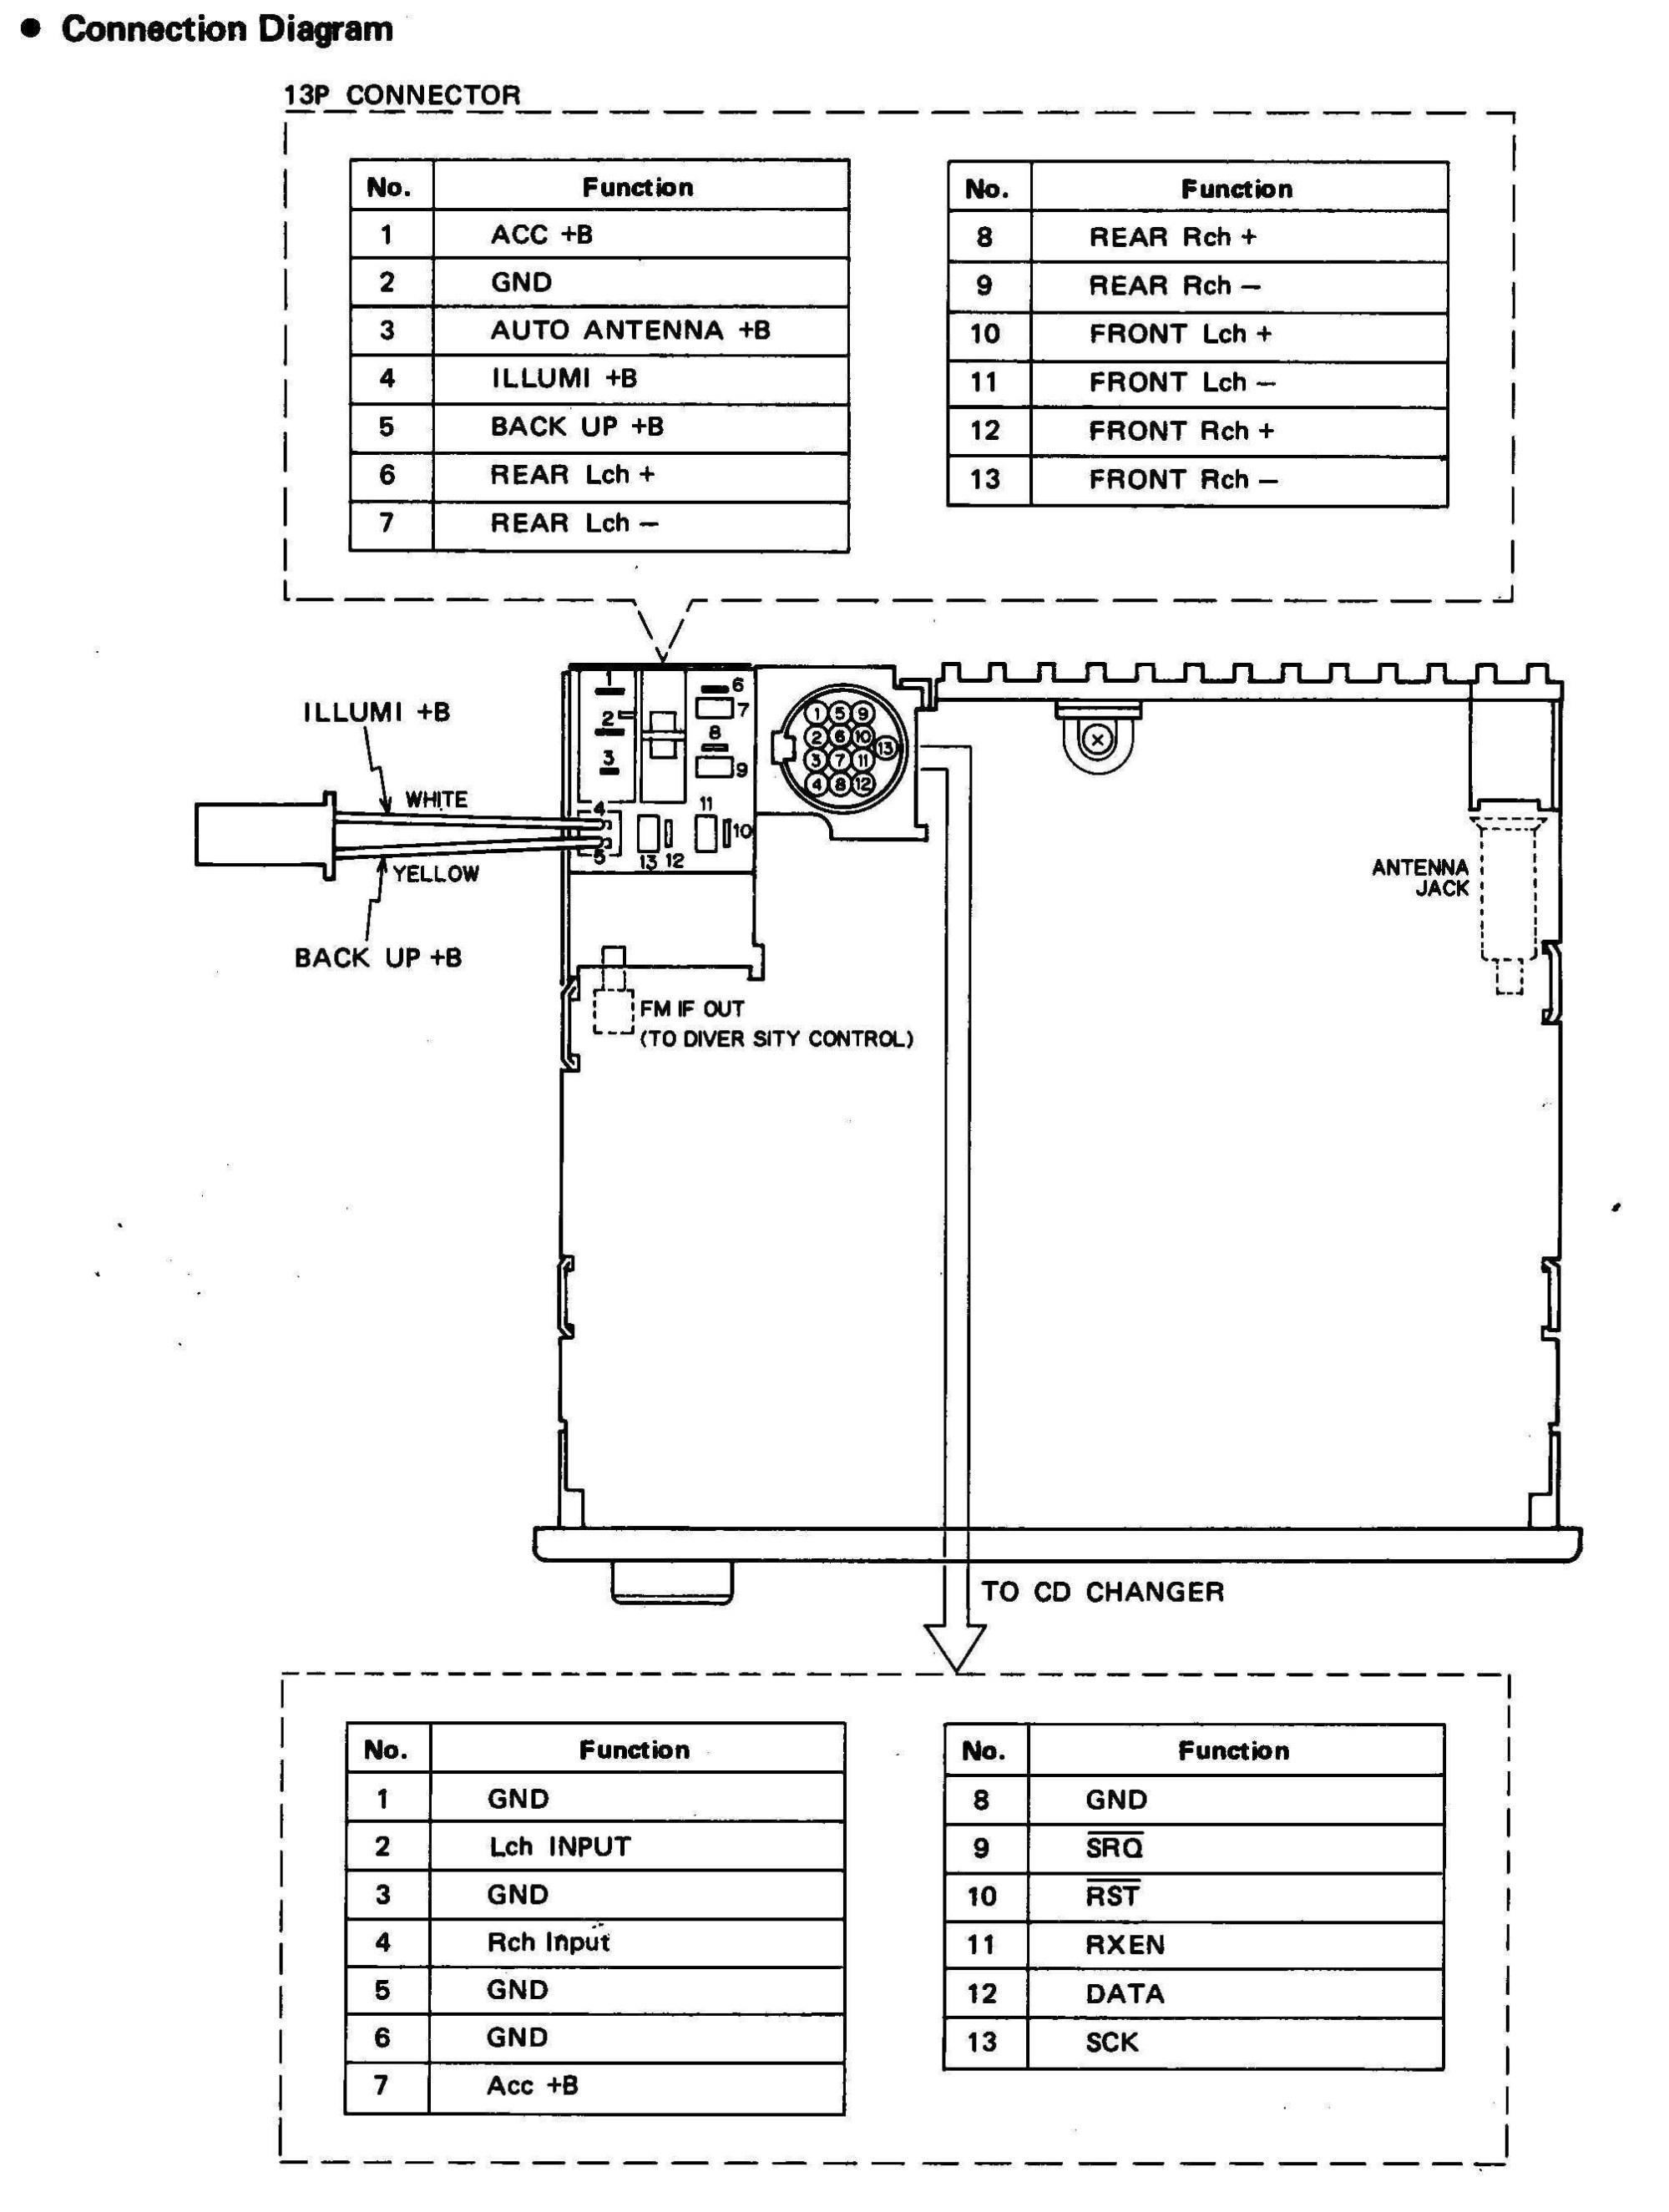 hight resolution of home speaker wiring diagram wiring diagram definition new home speaker wiring diagram 16d